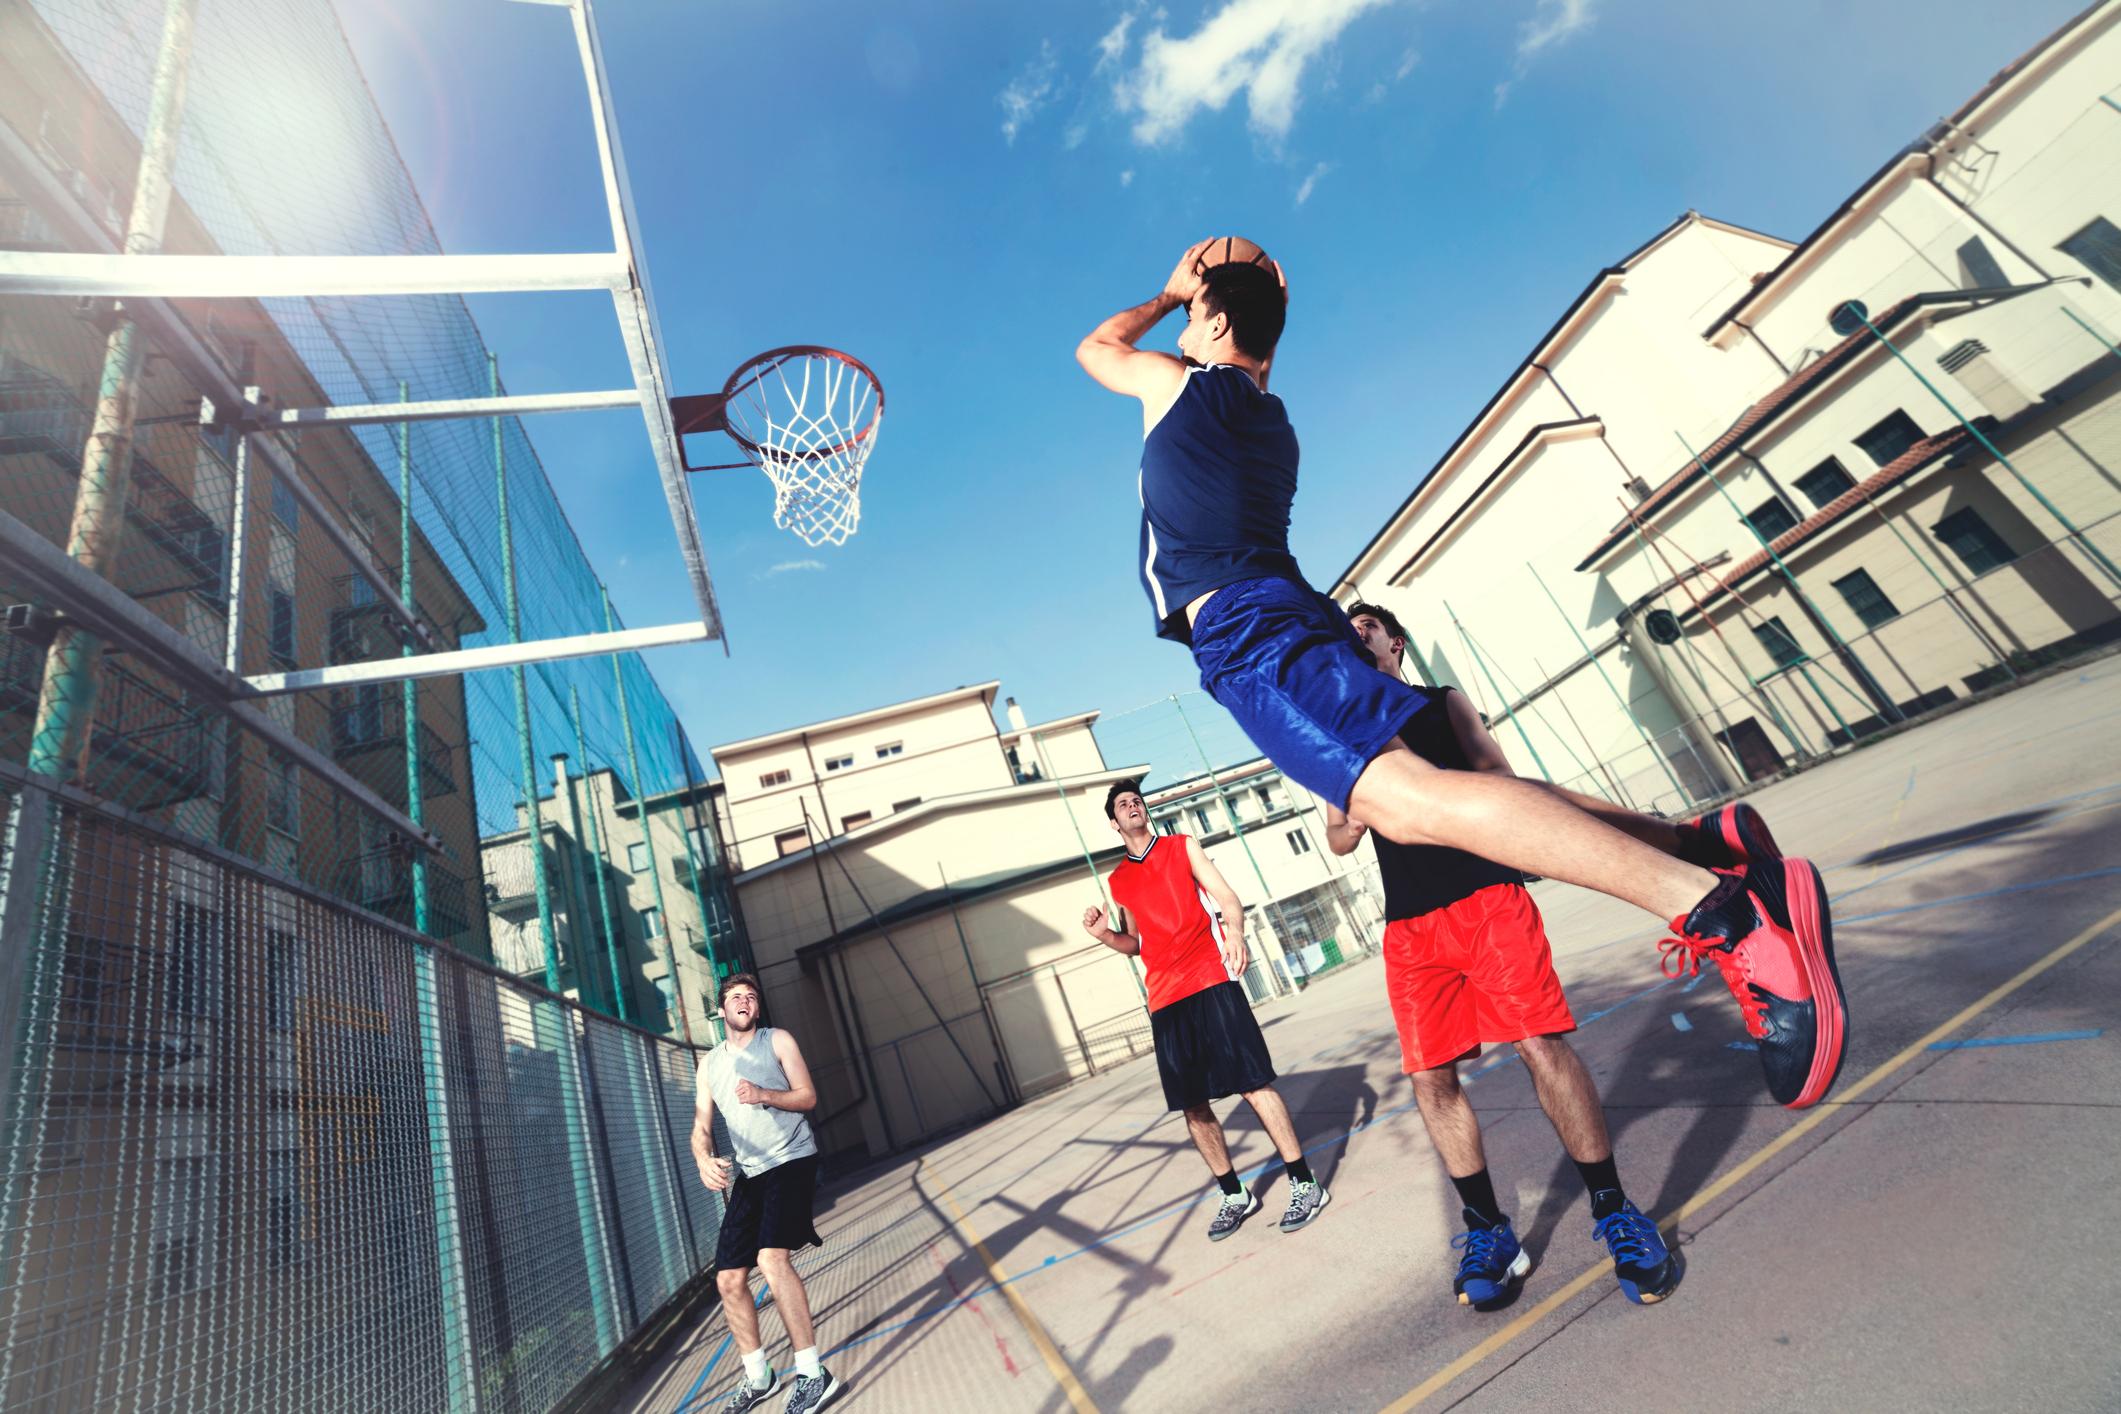 A pickup game of basketball.